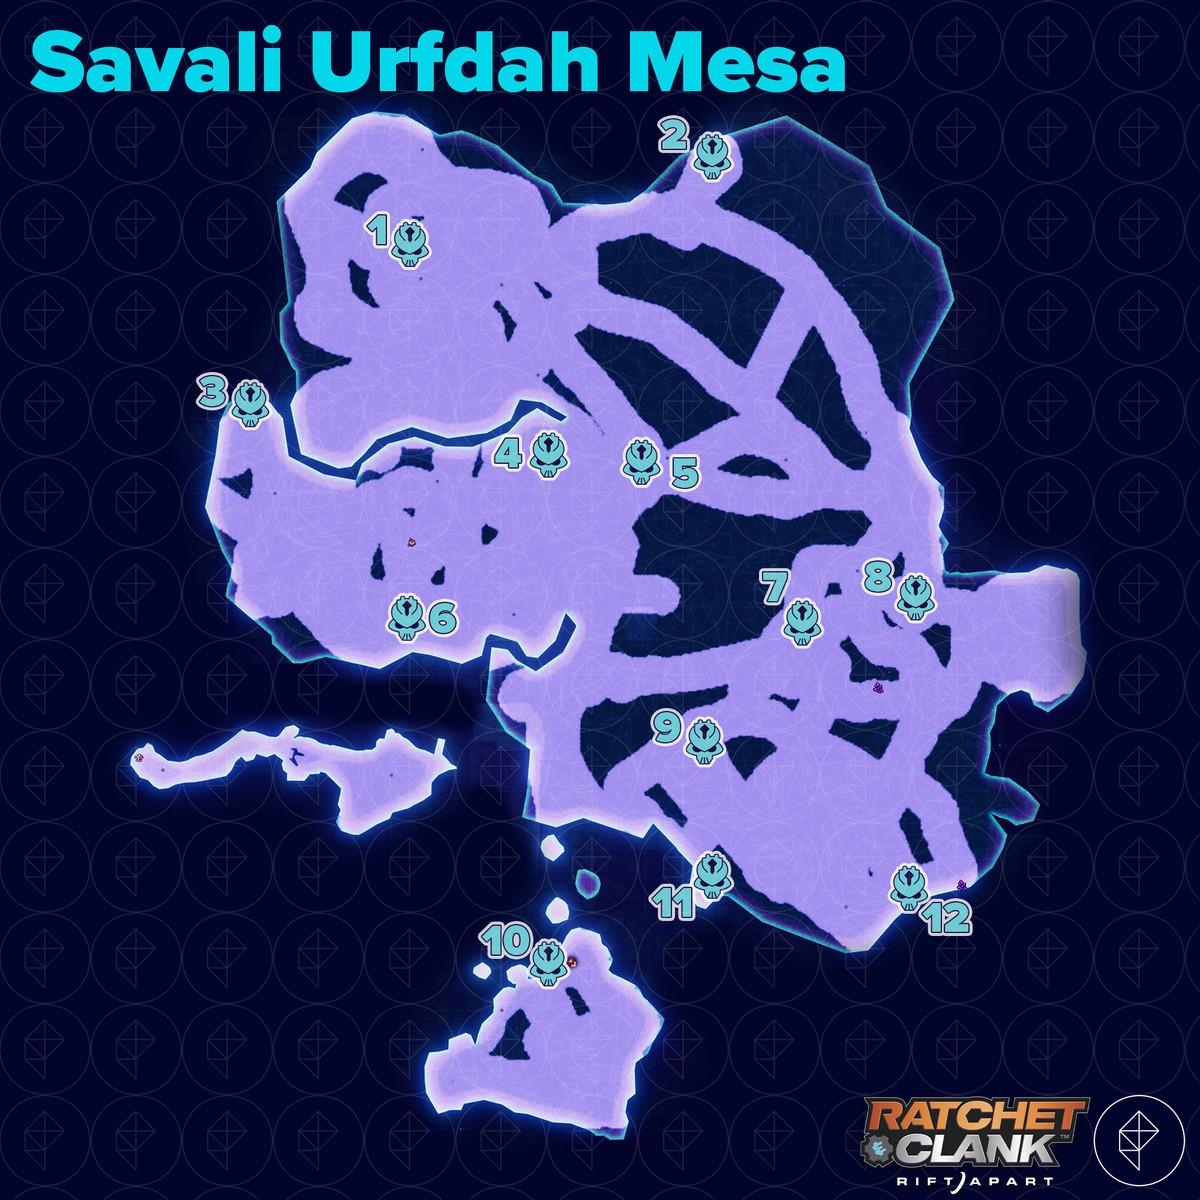 Ratchet & Clank: Rift Apart collectibles guide: Savali Urfdah Mesa